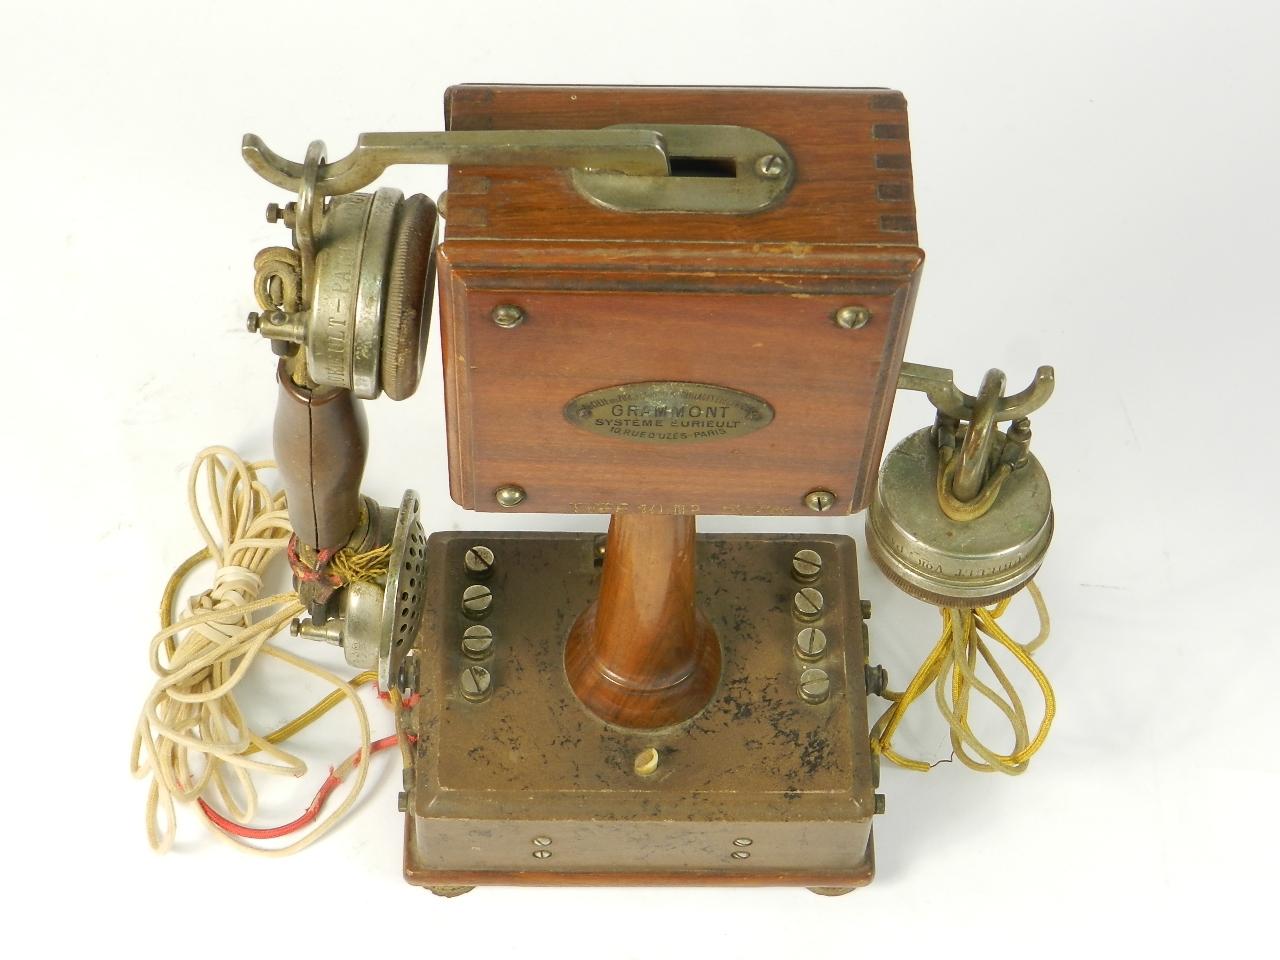 Imagen TELEFONO GRAMMONT TYPE Nº10 1915 38739